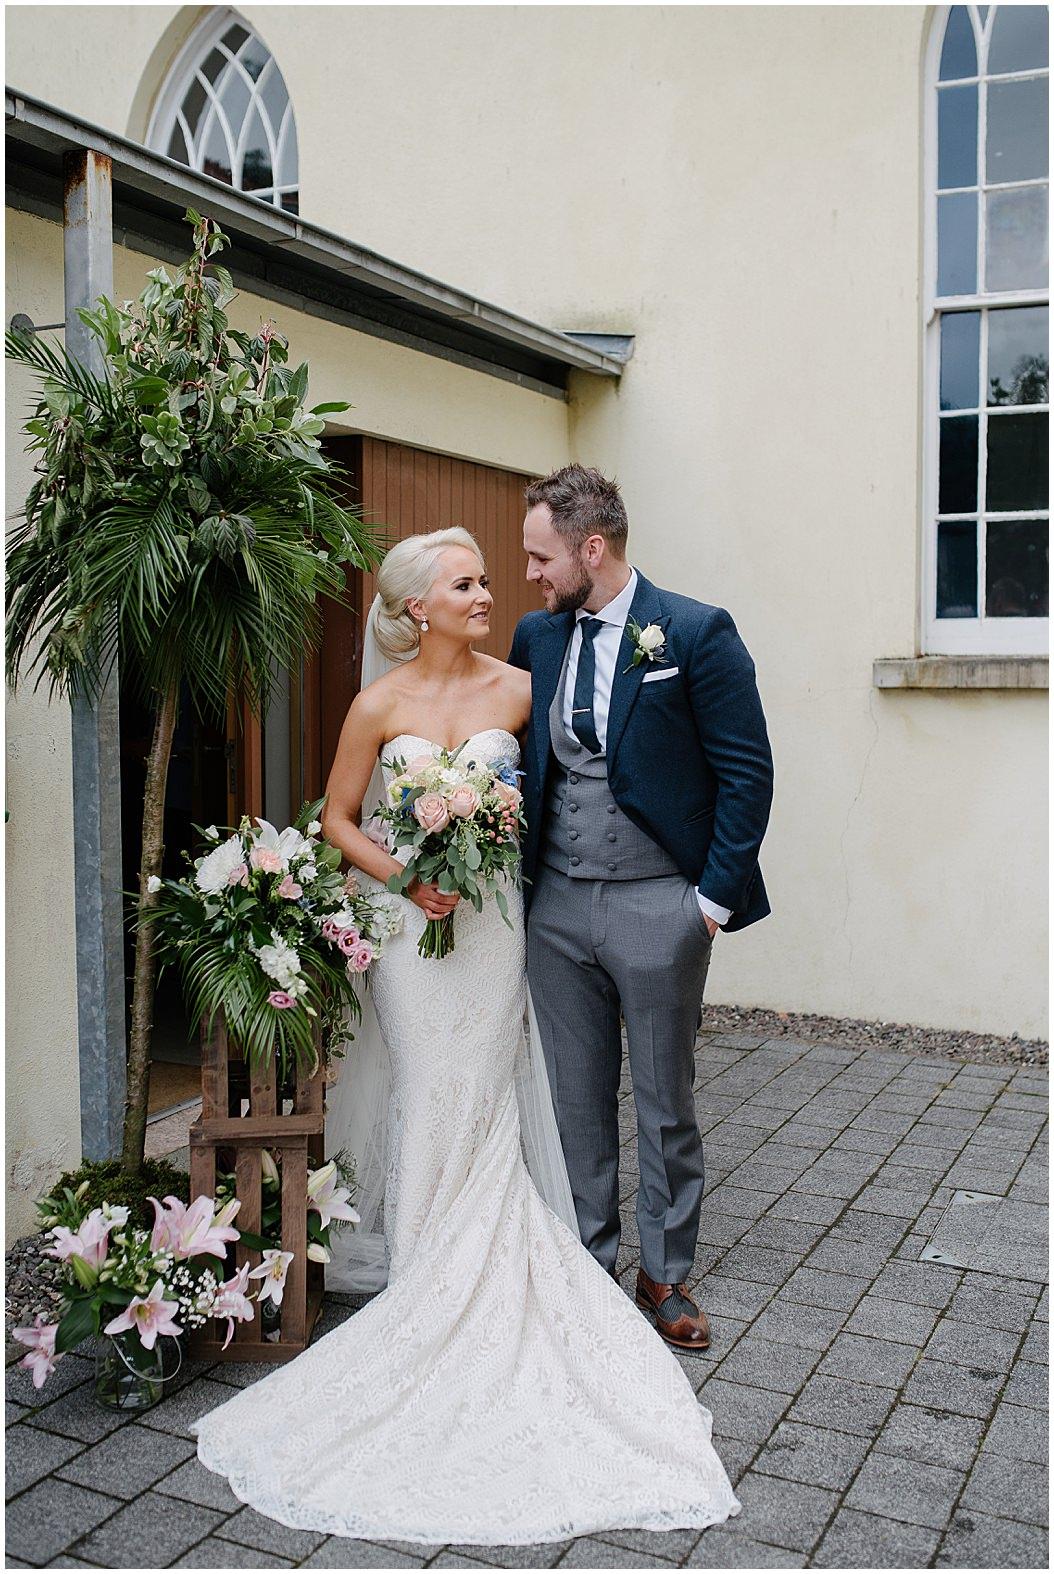 tempo-manor-wedding-jude-browne-photography_0088.jpg